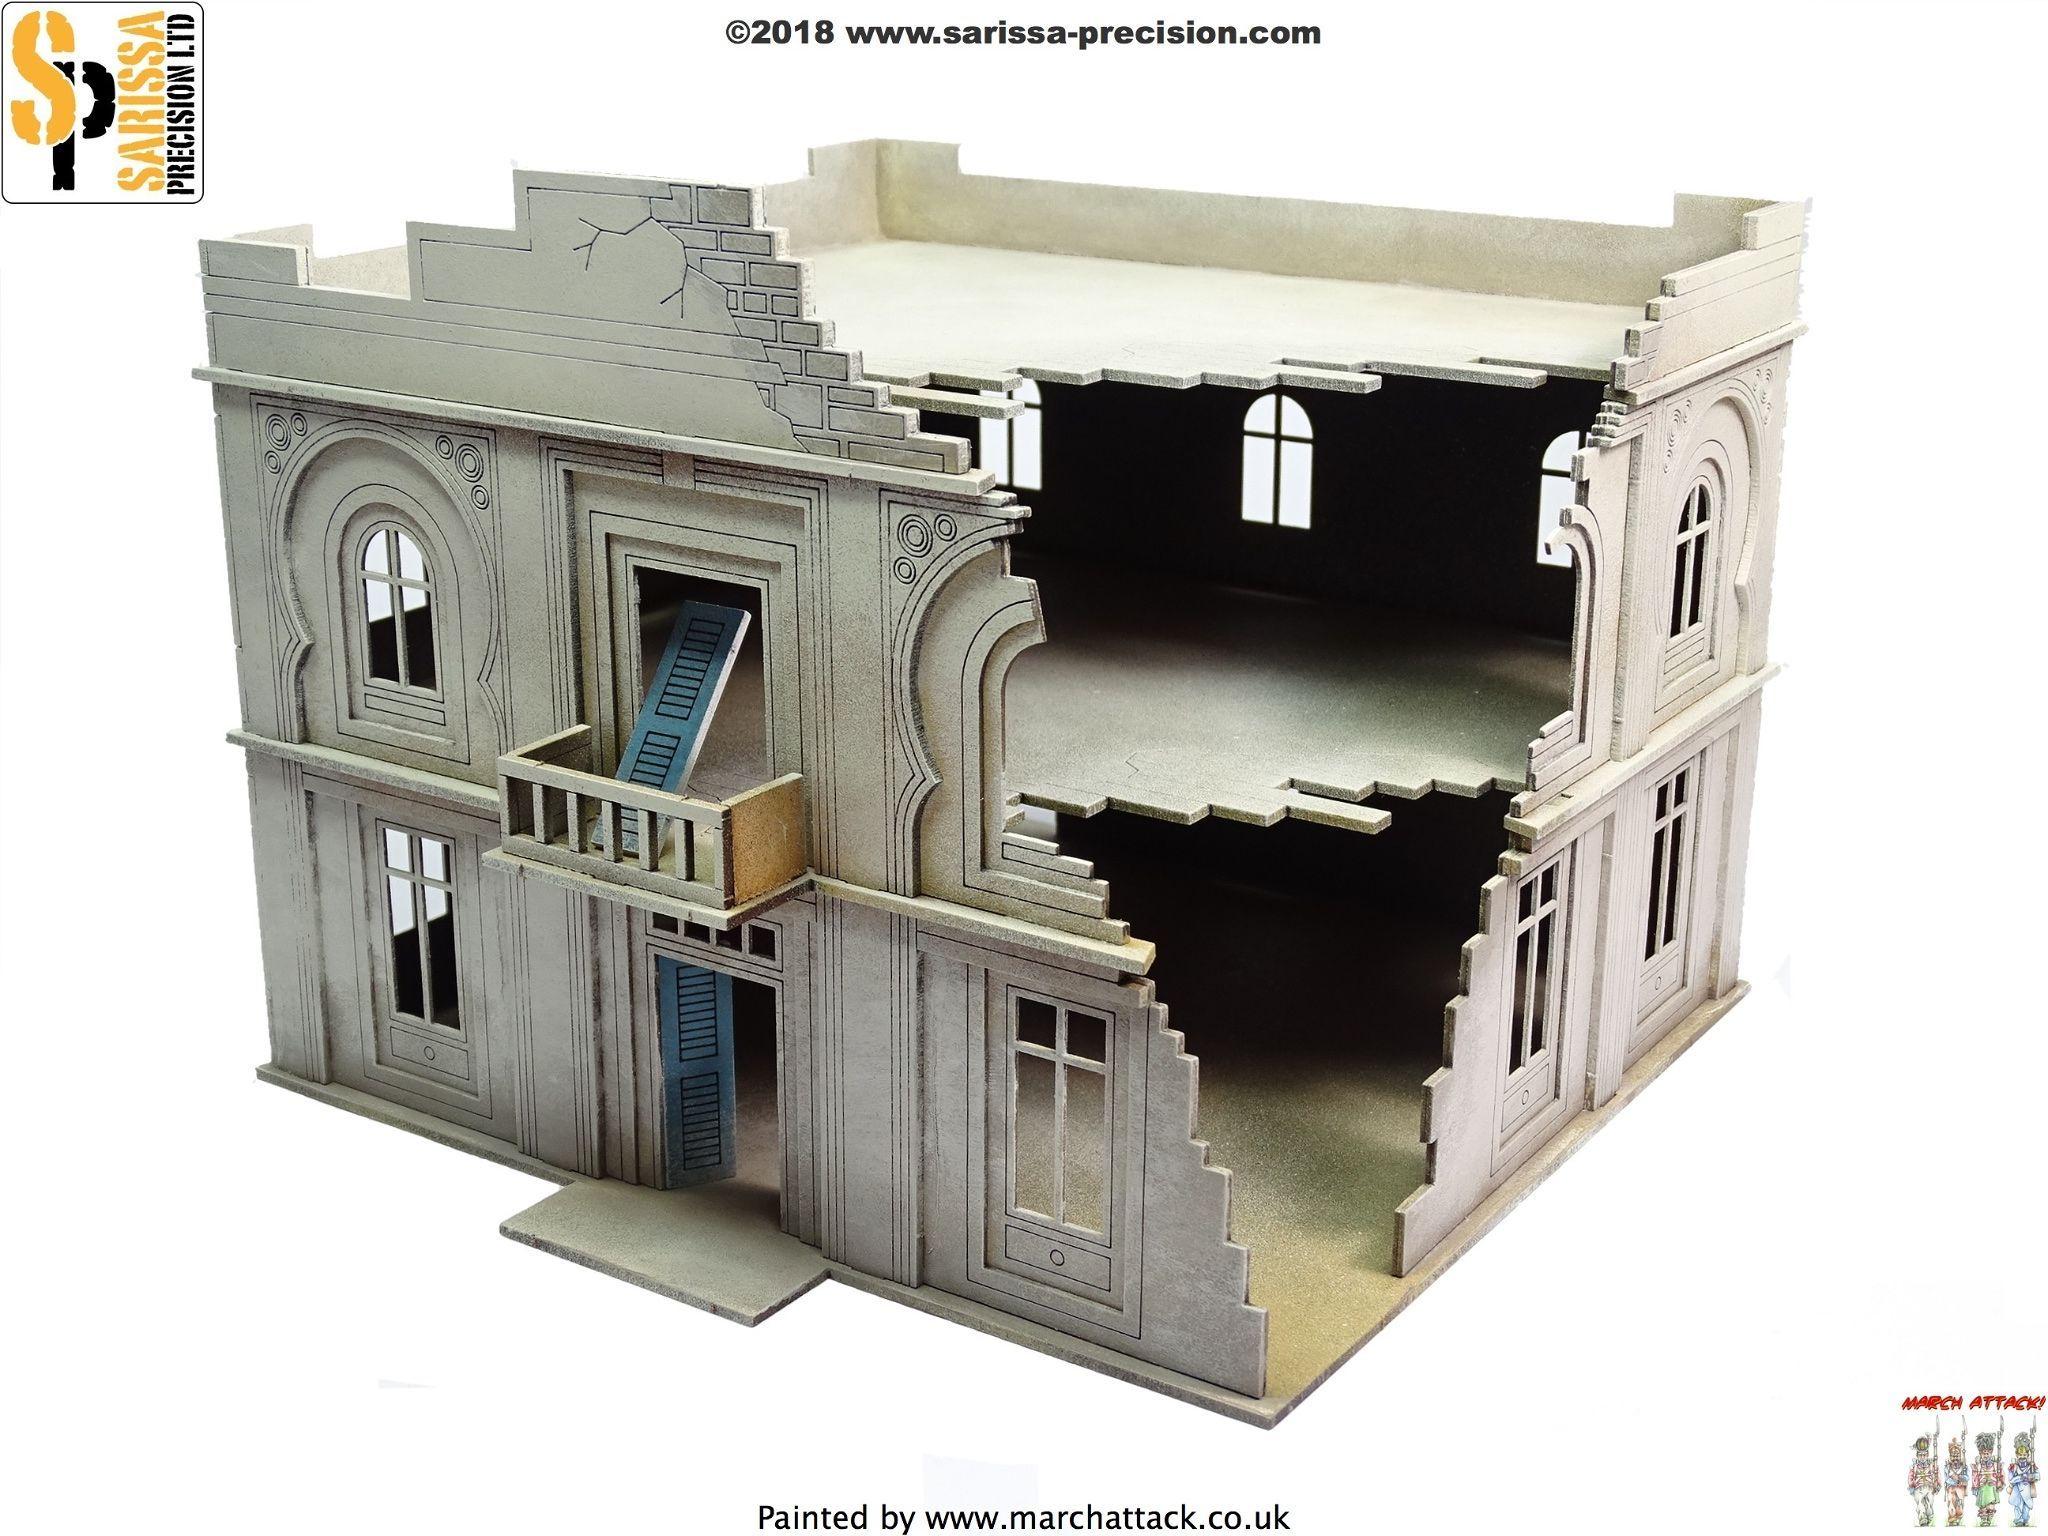 Destroyed Administration Building / Hotel, Sarissa Precision